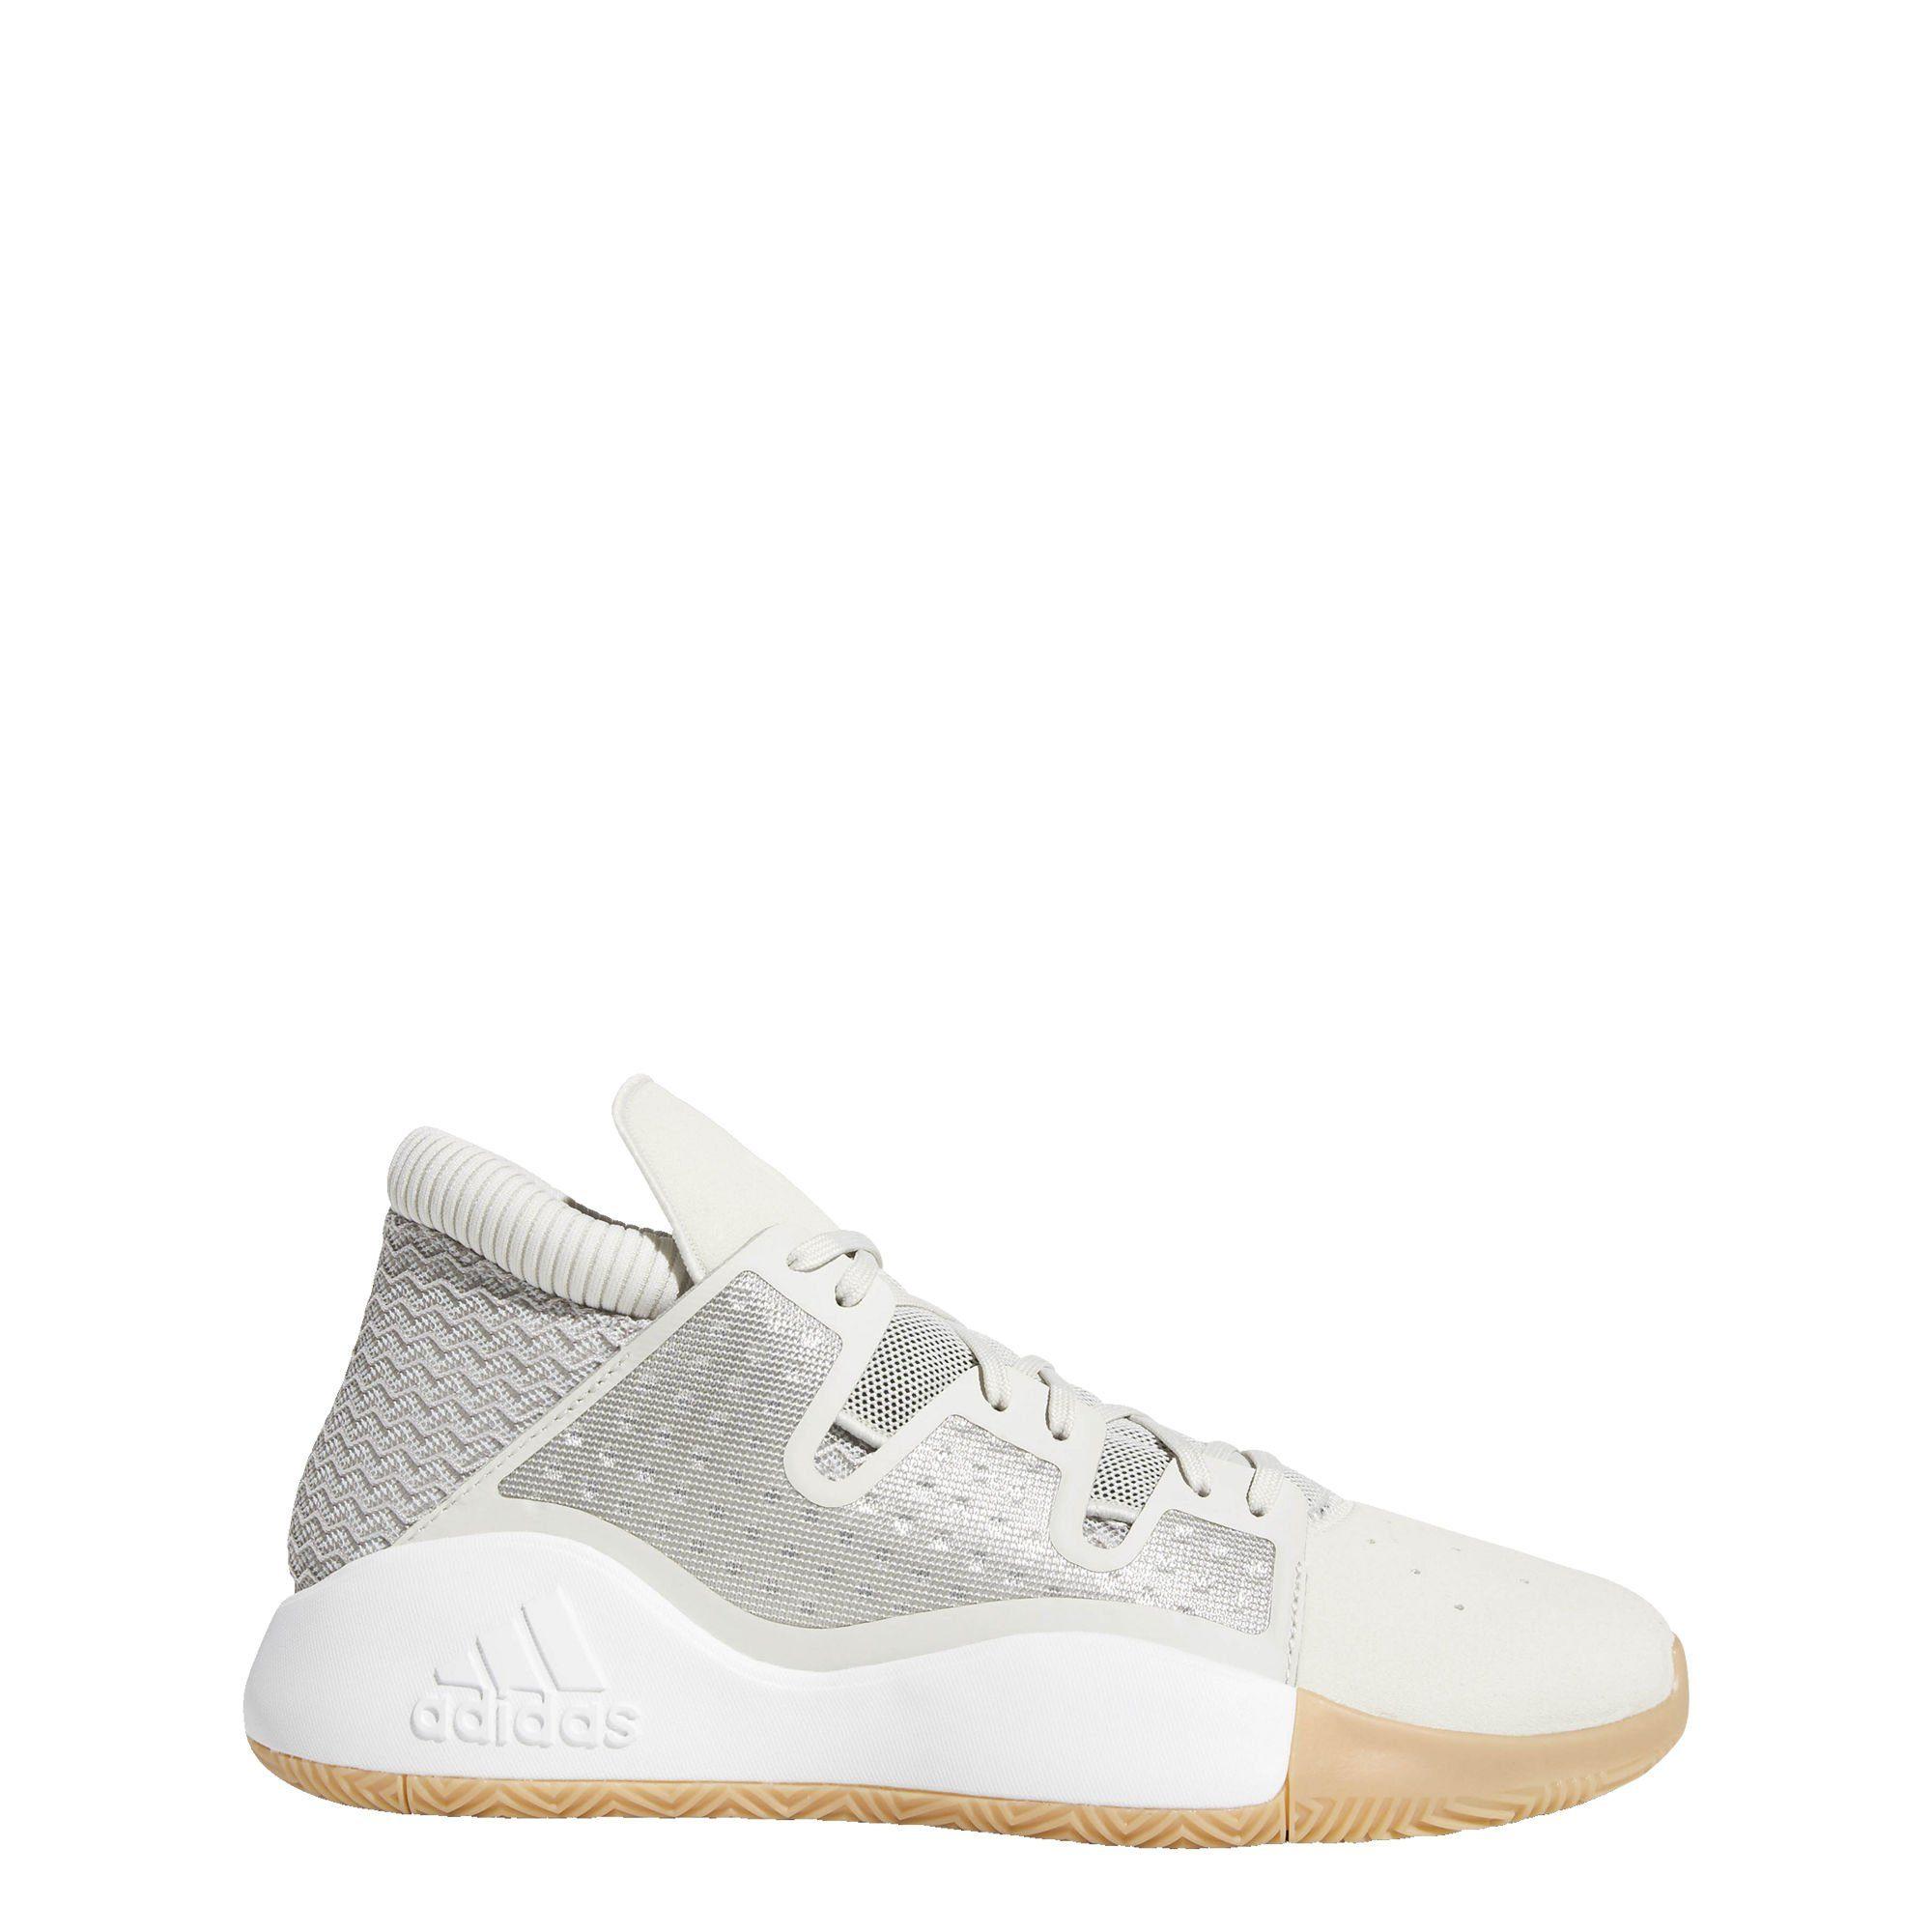 Basketballschuh KaufenOtto Schuh« Performance Adidas Vision »pro Online HD2W9IE